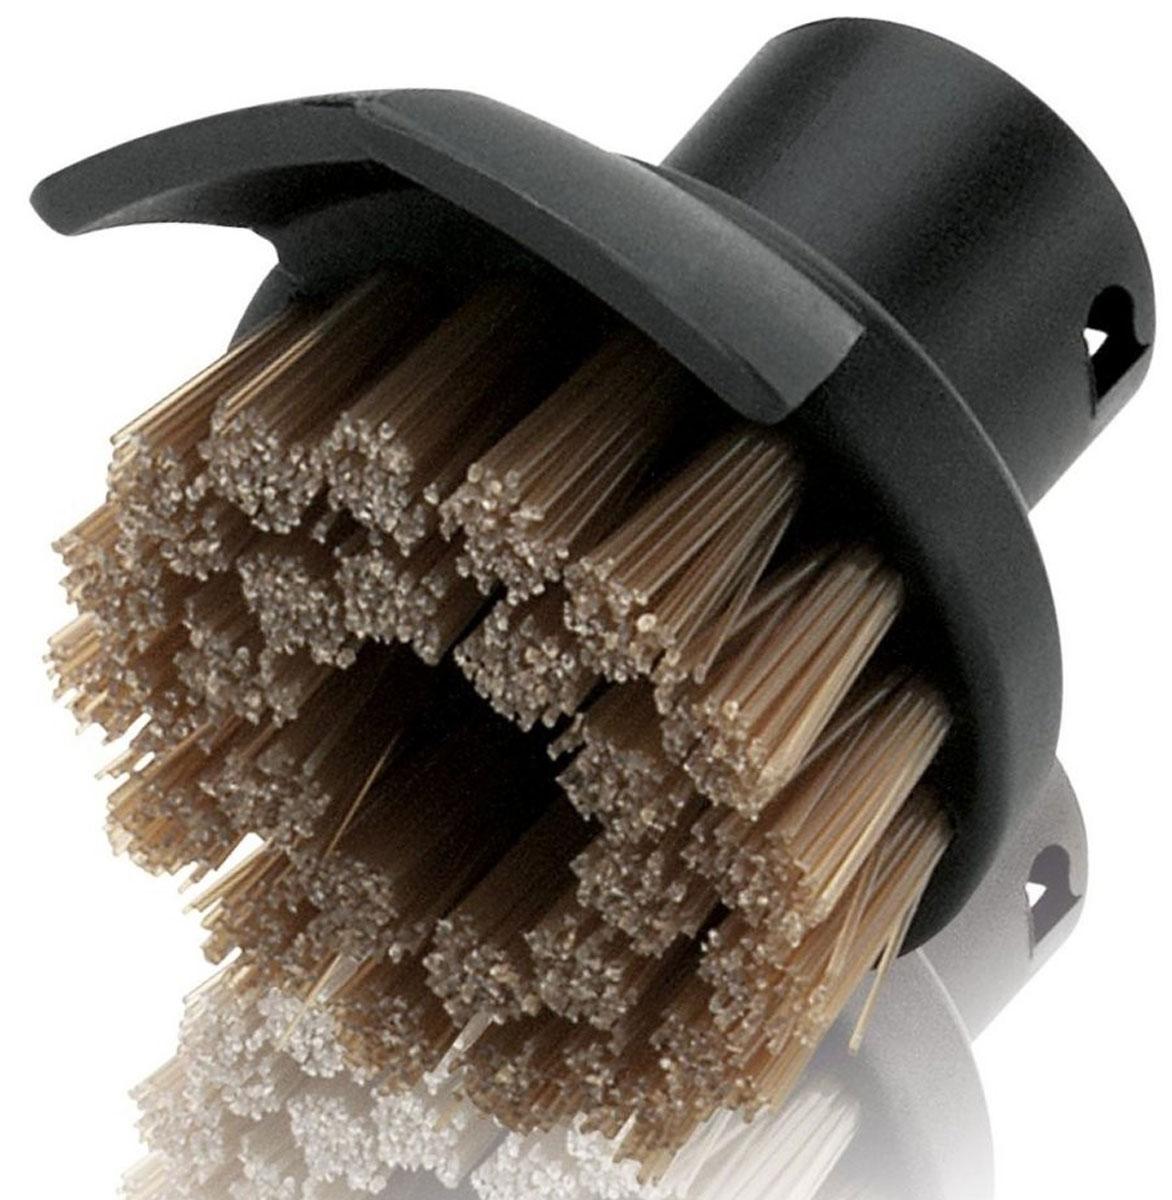 Karcher 28631400 насадка для пароочистителя насадка для пылесоса karcher 2 863 000 0